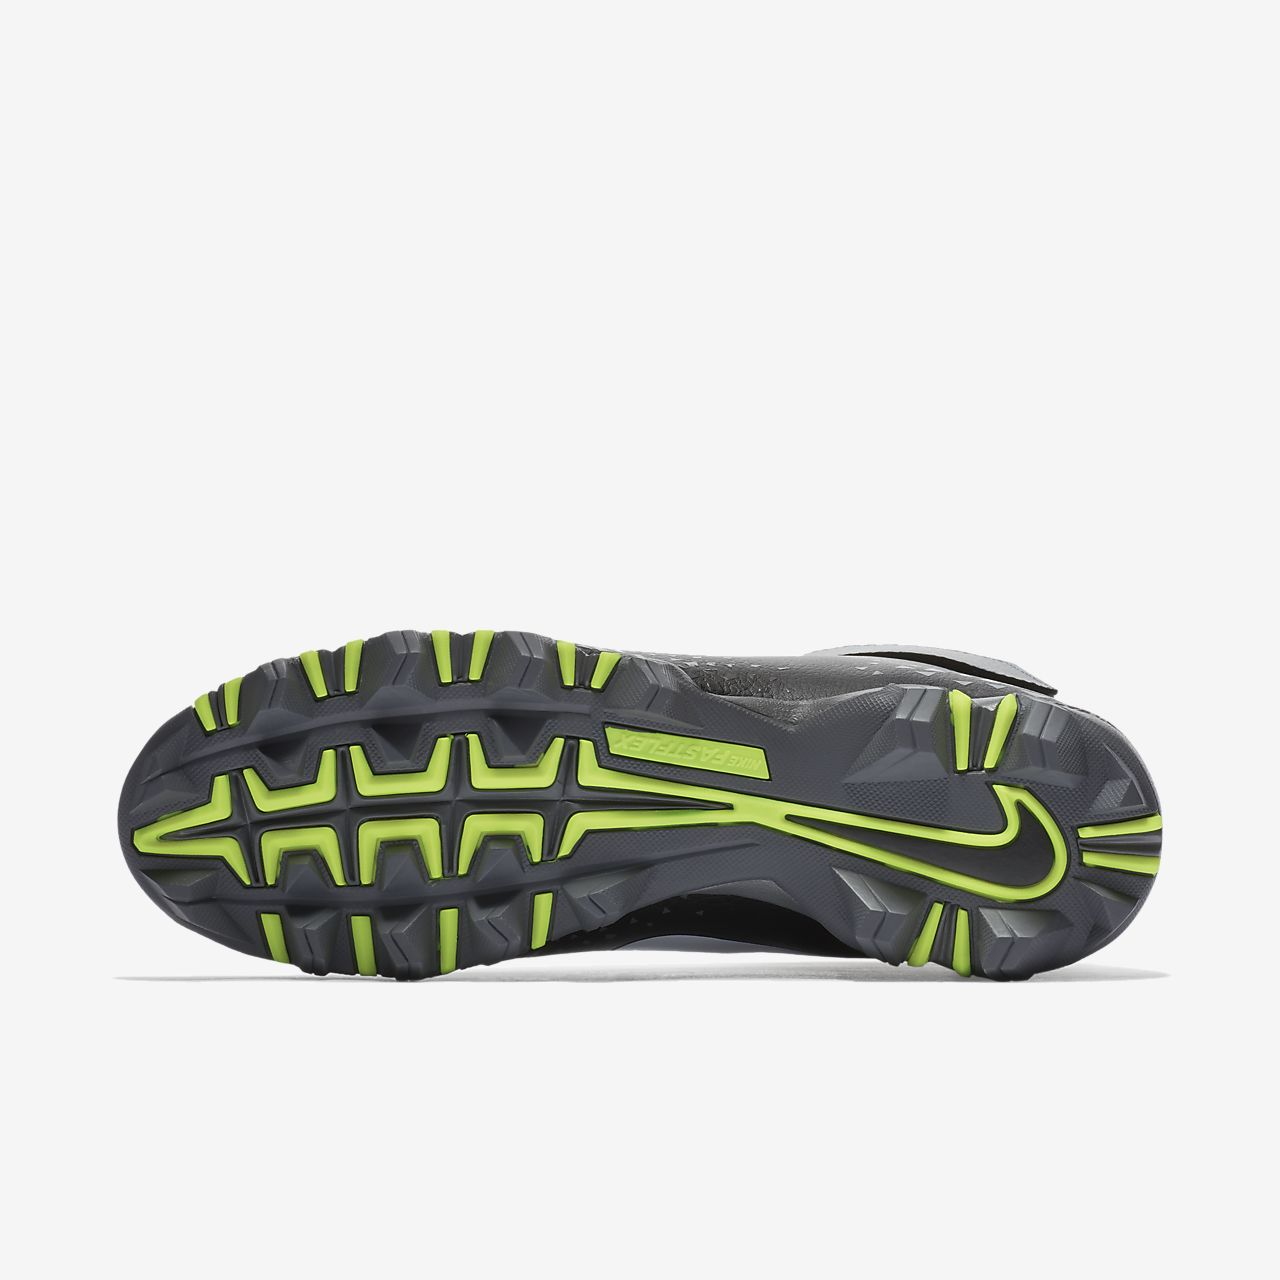 81408fdb318 Nike Force Savage Shark Football Cleat. Nike.com